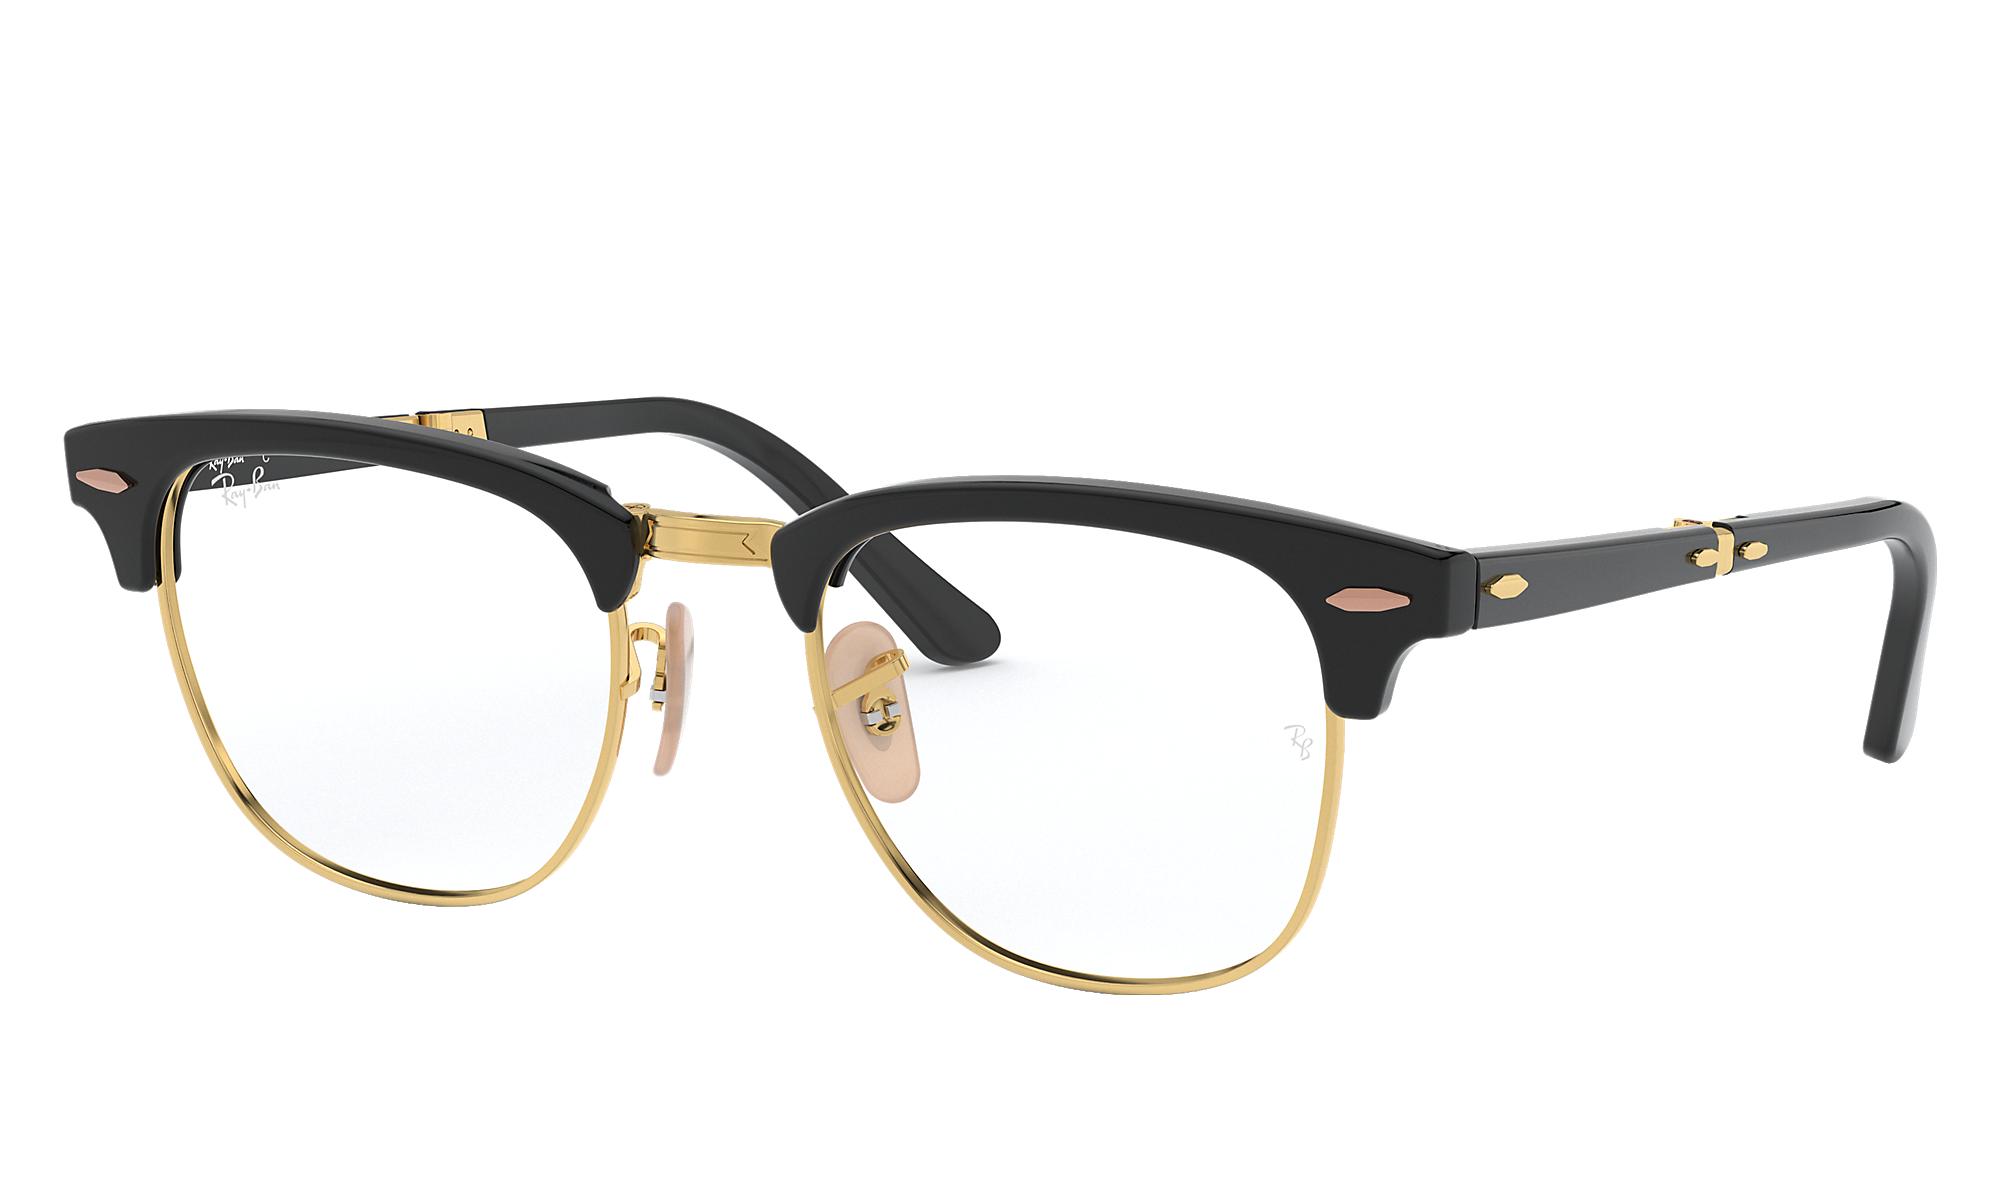 8c6950e33b97 Ray-Ban Clubmaster Folding Optics   Glasses.com®   Free Shipping